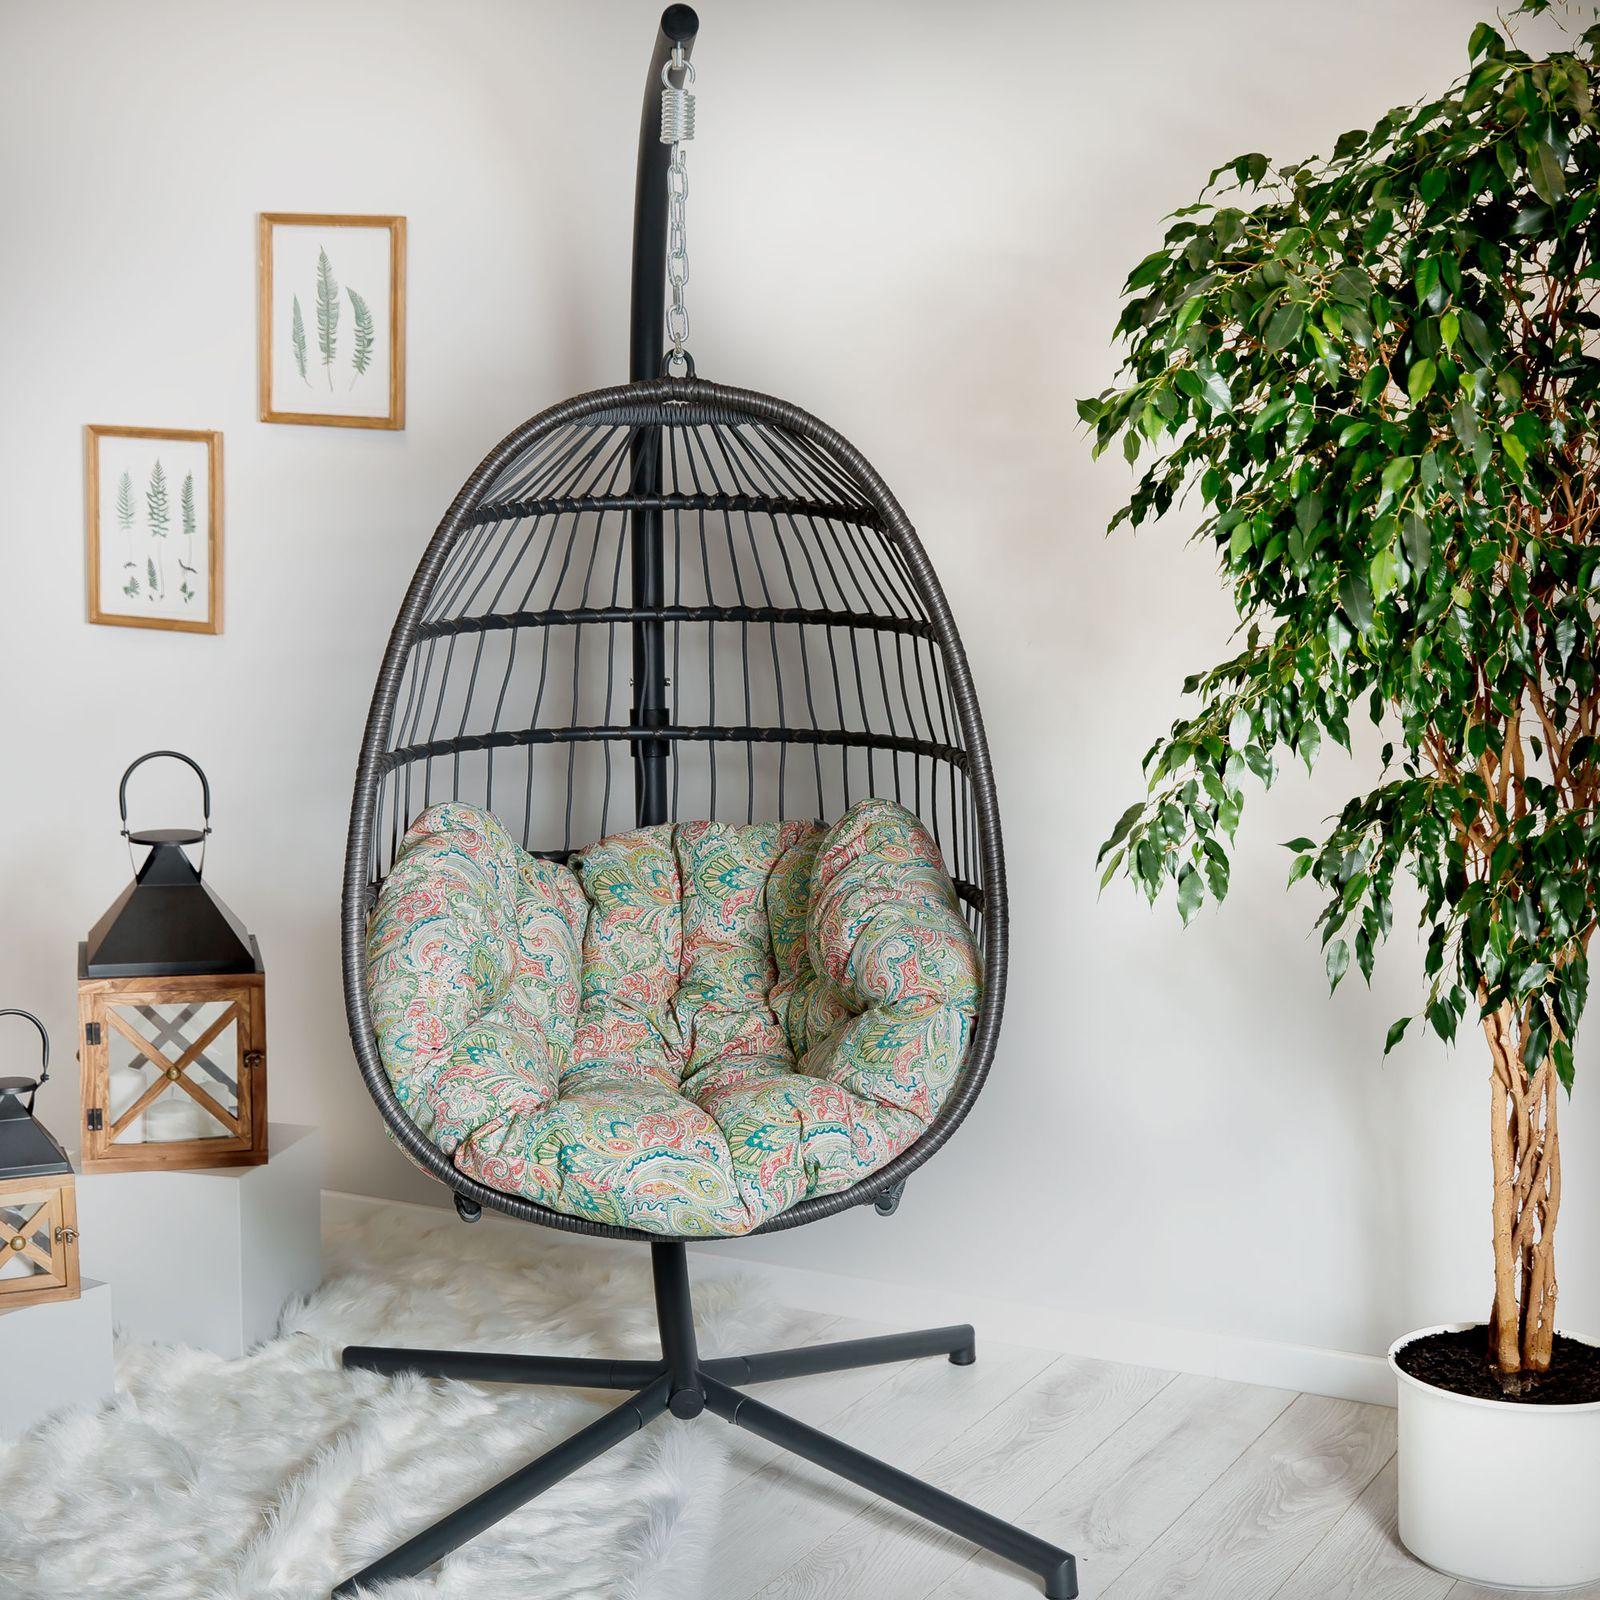 Cojín ovalado para silla colgante G038-12LB 144 x 100/45 x 10/12 cm PATIO